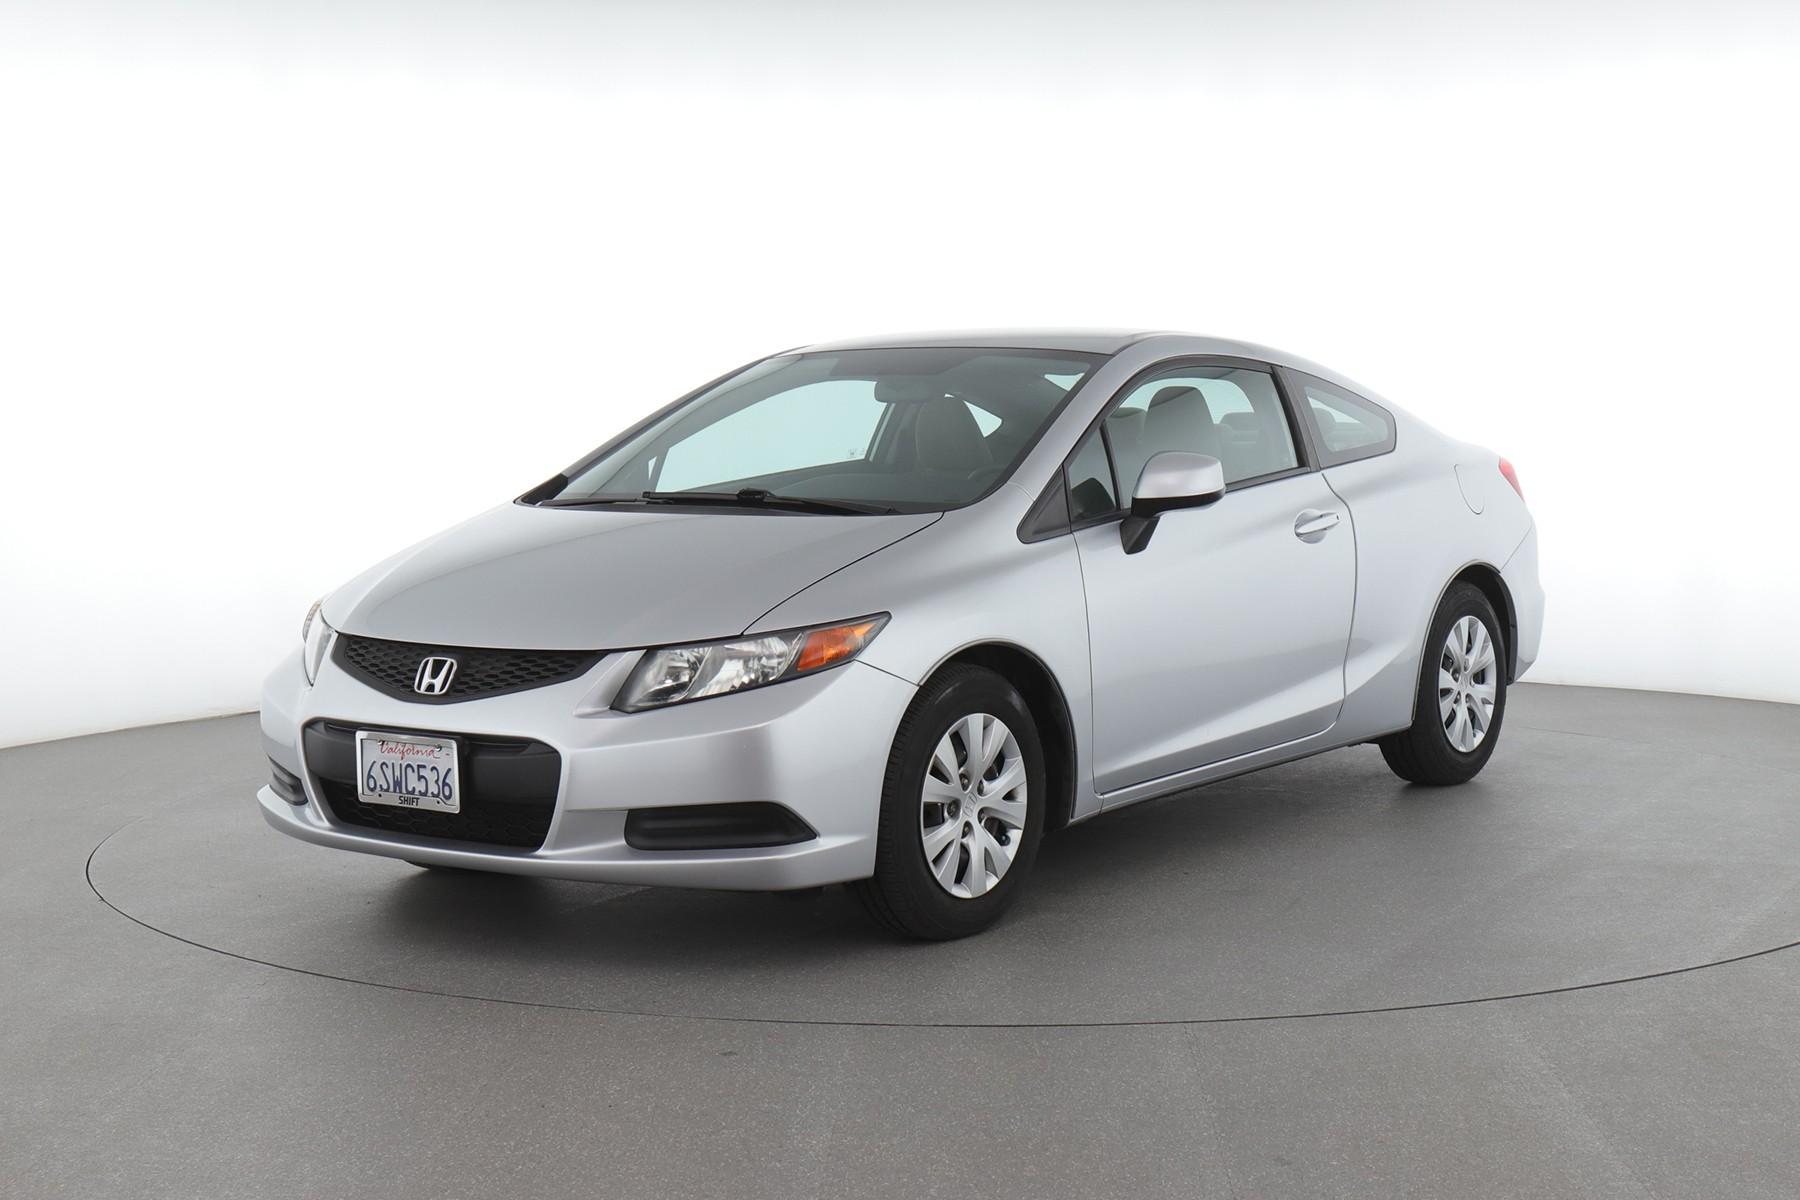 2012 Honda Civic (from $9,950)